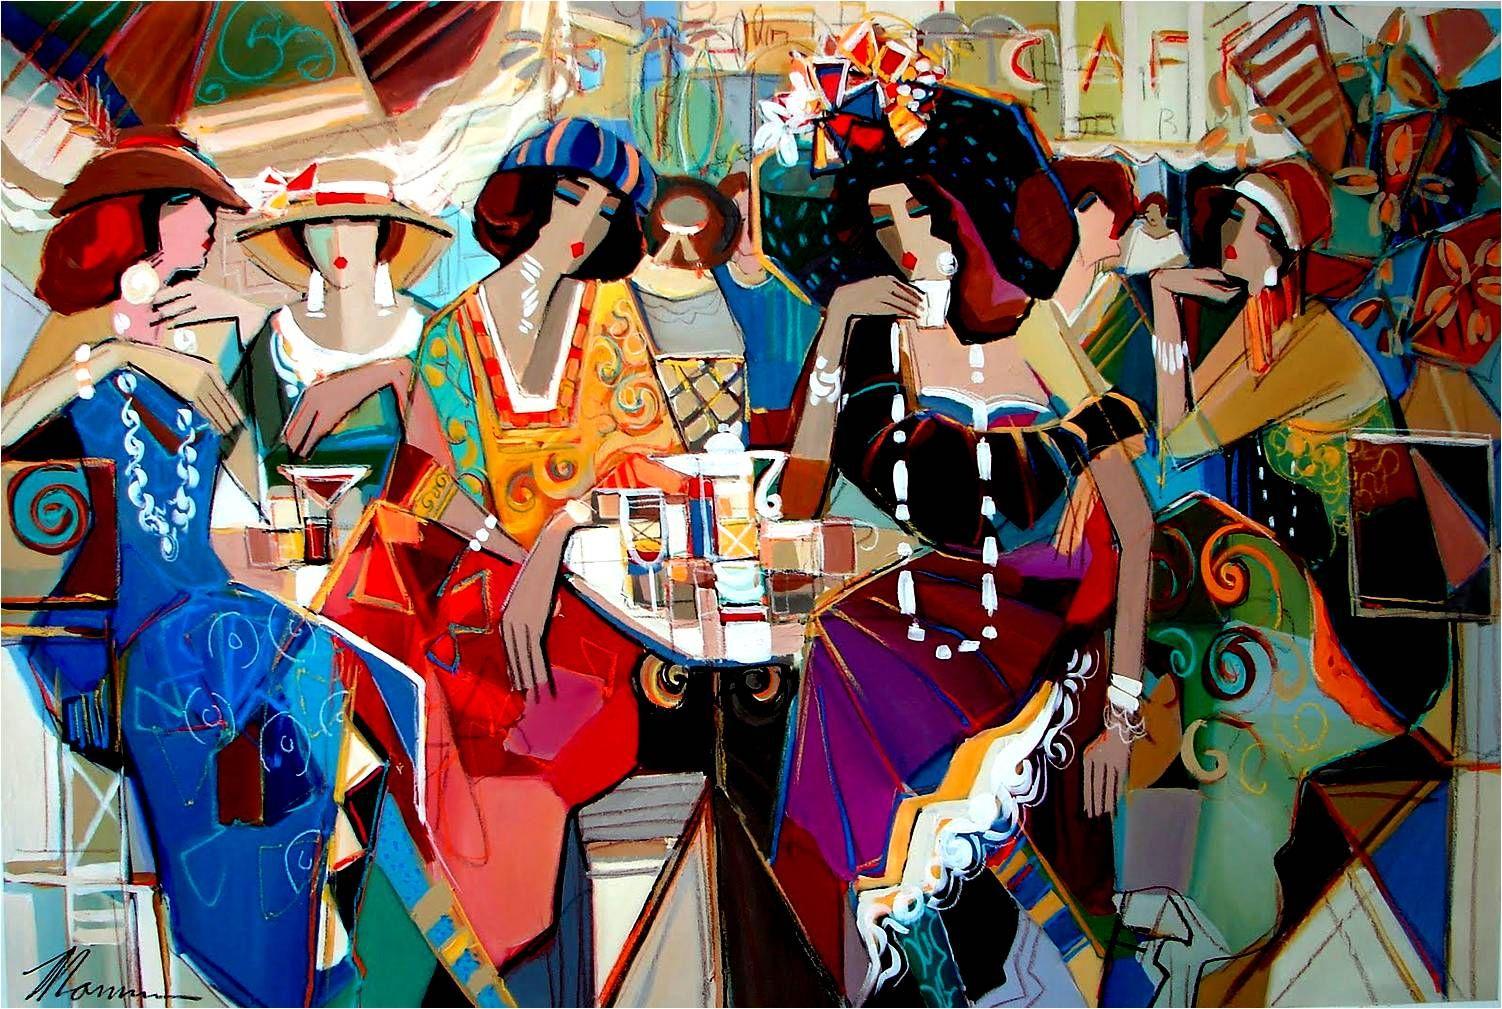 Artworks by Isaac Maimon . Обсуждение на LiveInternet - Российский Сервис Онлайн-Дневников